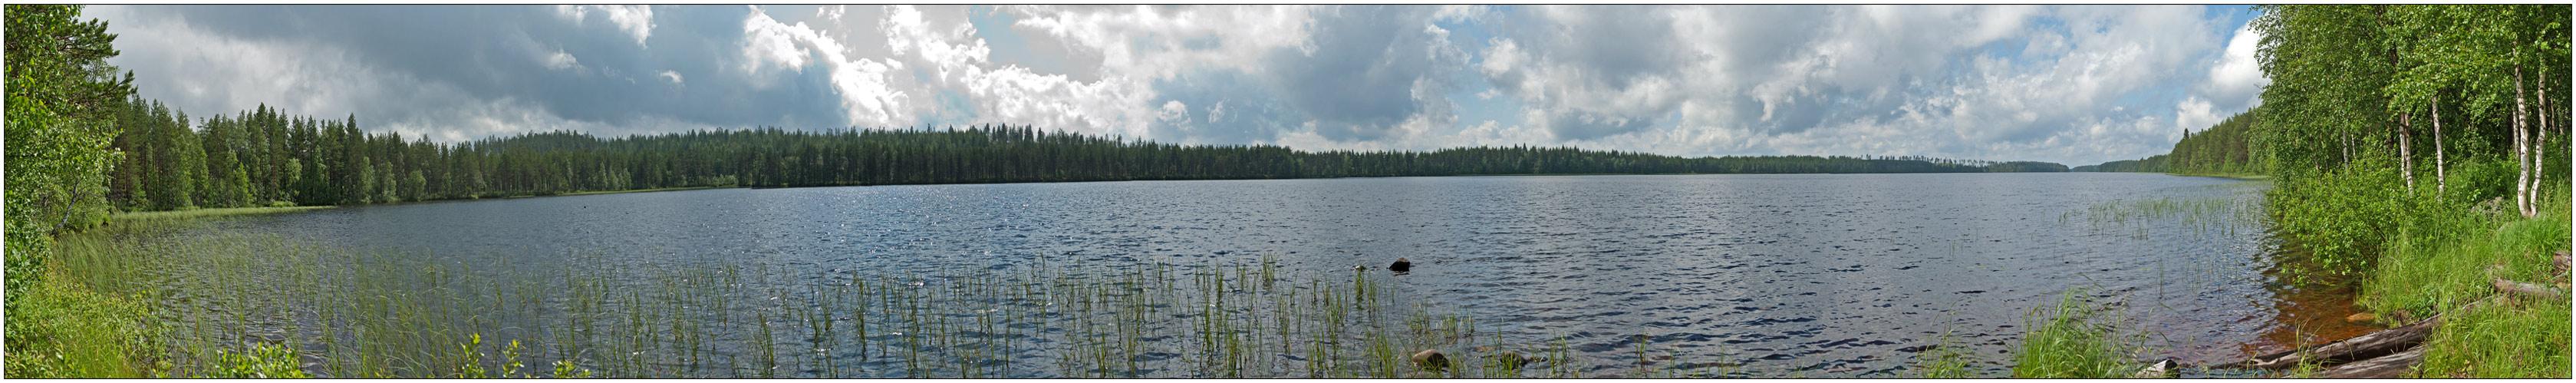 Finnland Bärenland [54] - Ruhe